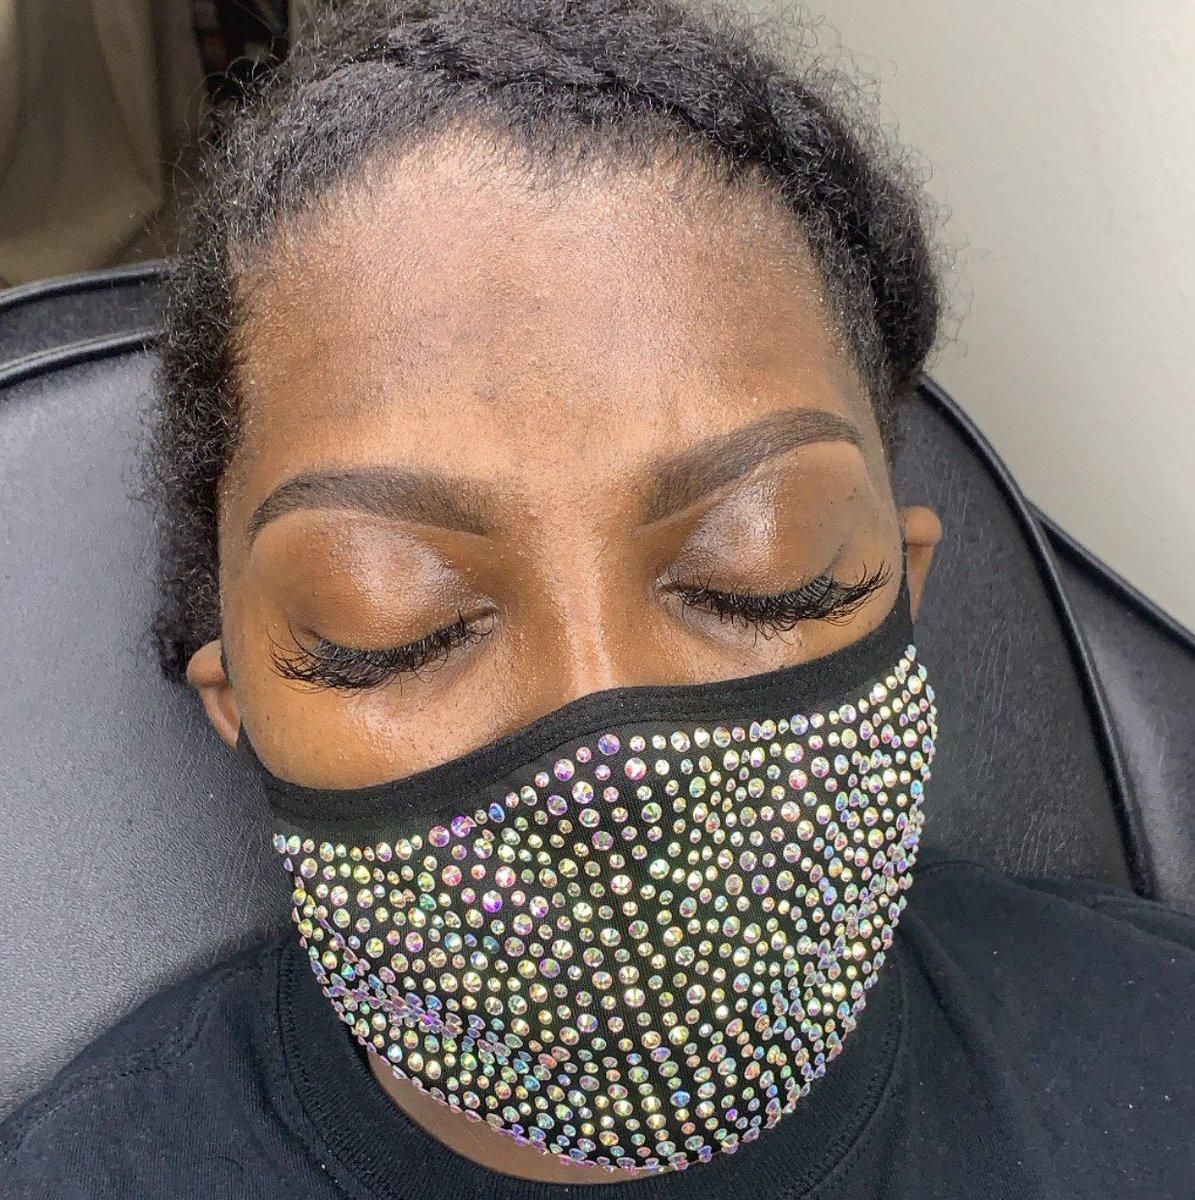 On point  right? #browtinting #atl #montgomery #chicago #newyork #eyebrowshaping #eyebrowsonfleek #myasu #BrowsByLexx #GodDessCityLLC #GodDessCity #chicagospa #pmu #pmubrows #makeuptutorial #chicagomicroshading #sanantoniopmuartist #blogger #fashion #tattoo #boutique #trendingpic.twitter.com/UmlTnbnc4n